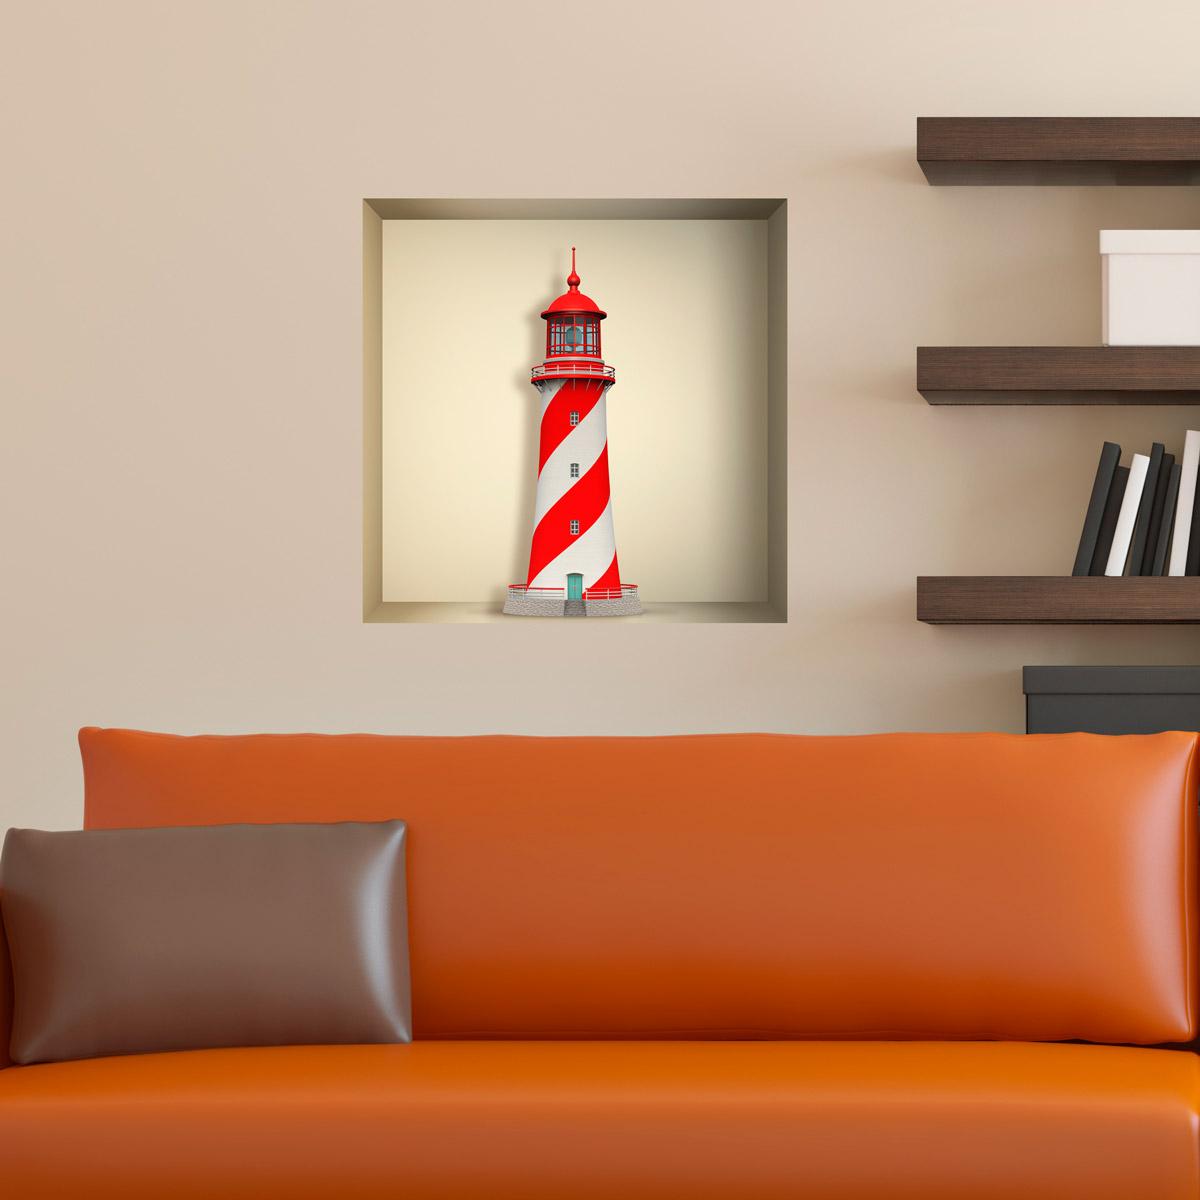 http://www.teleadhesivo.com/es/vinilos-decorativos/producto/nichos---estantes-495/nicho-faro-maritimo-19272